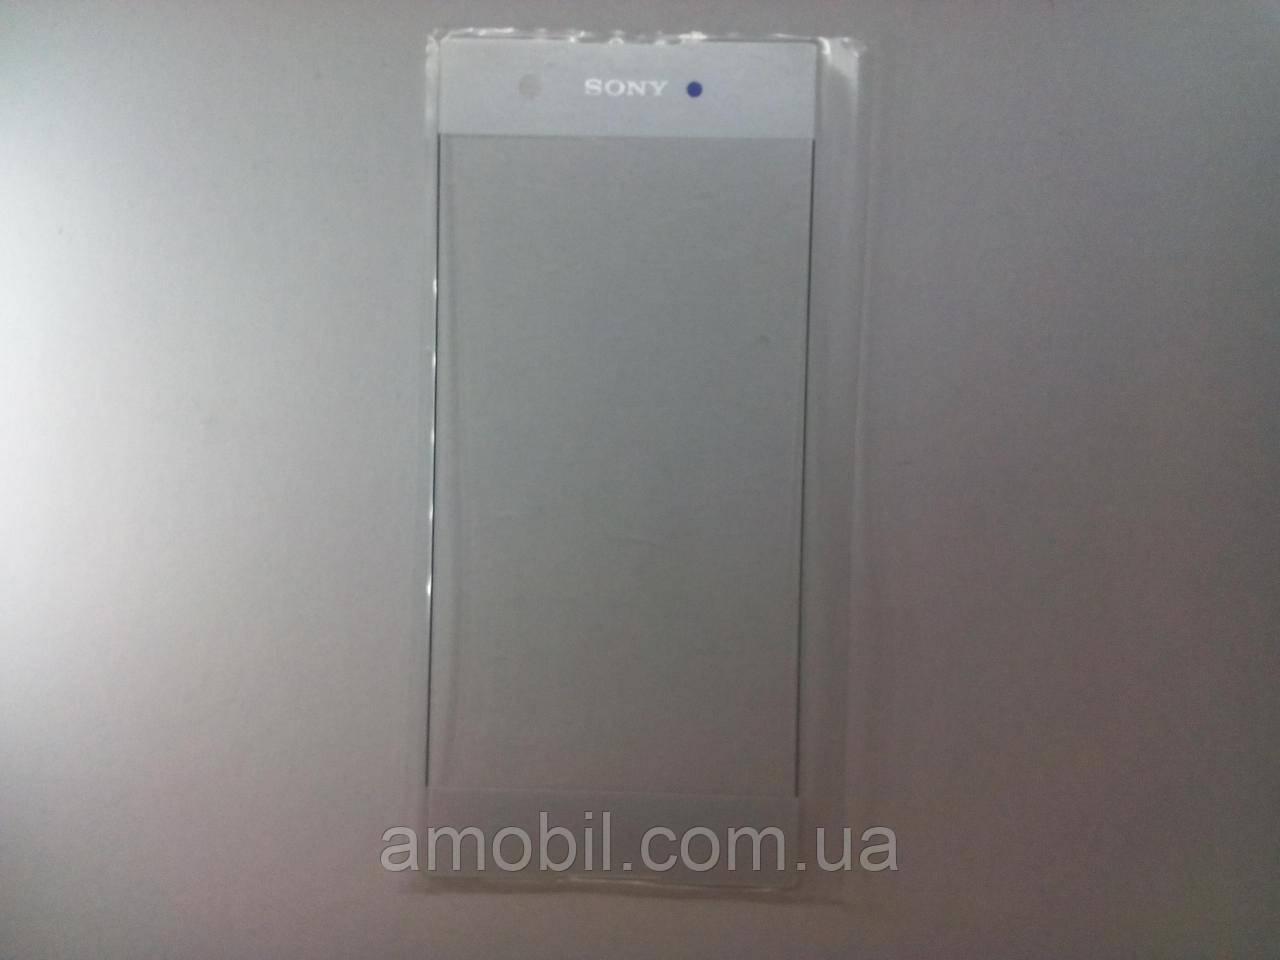 Стекло Sony G3112 Xperia XA1 / G3116 Xperia XA1 / G3121 Xperia XA1 / G3123 Xperia XA1 / G3125 Xperia XA1 white